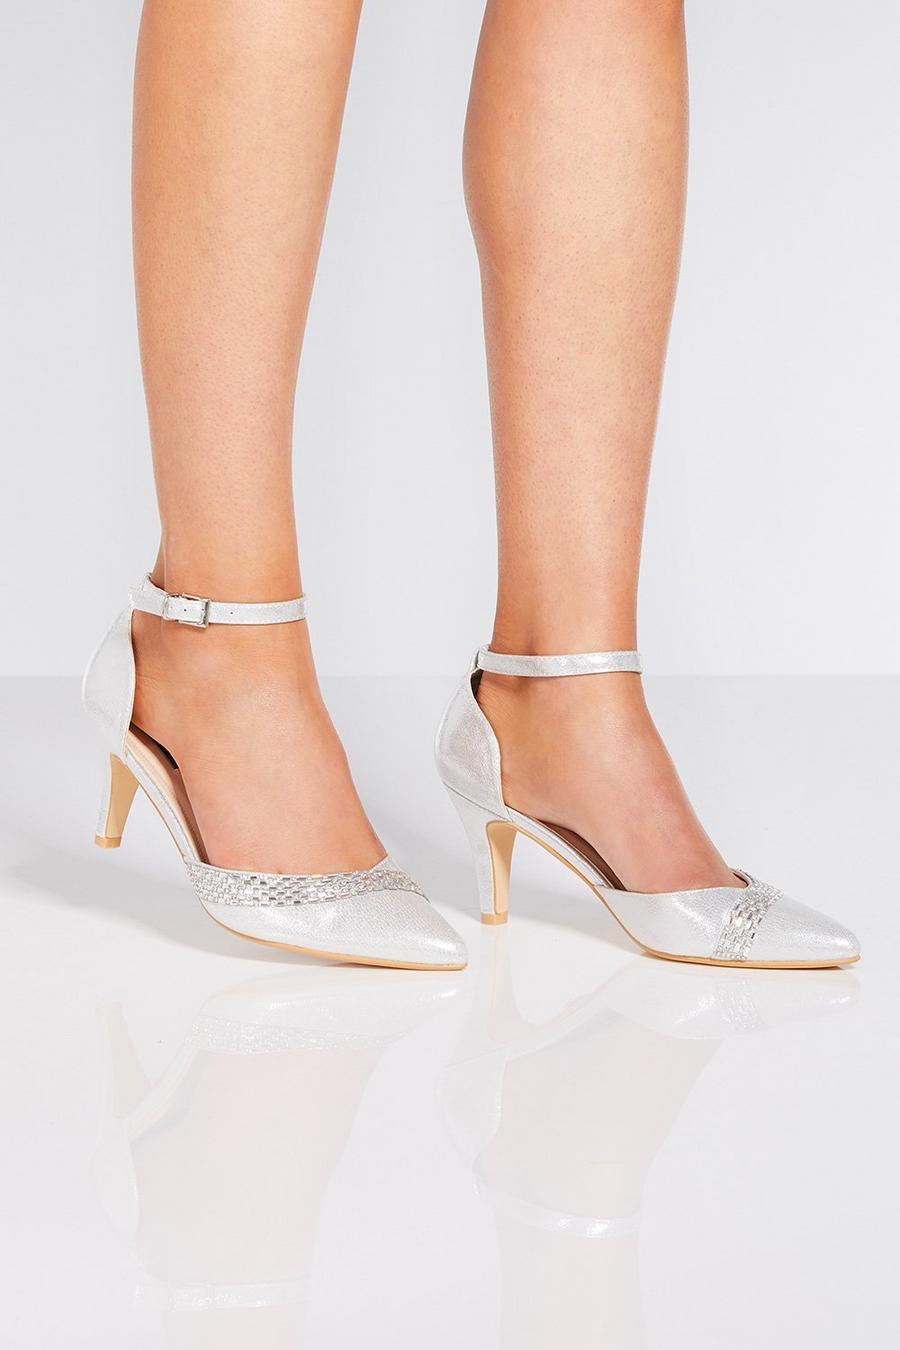 c5bd7ed135d Silver Shimmer Diamante Low Heels